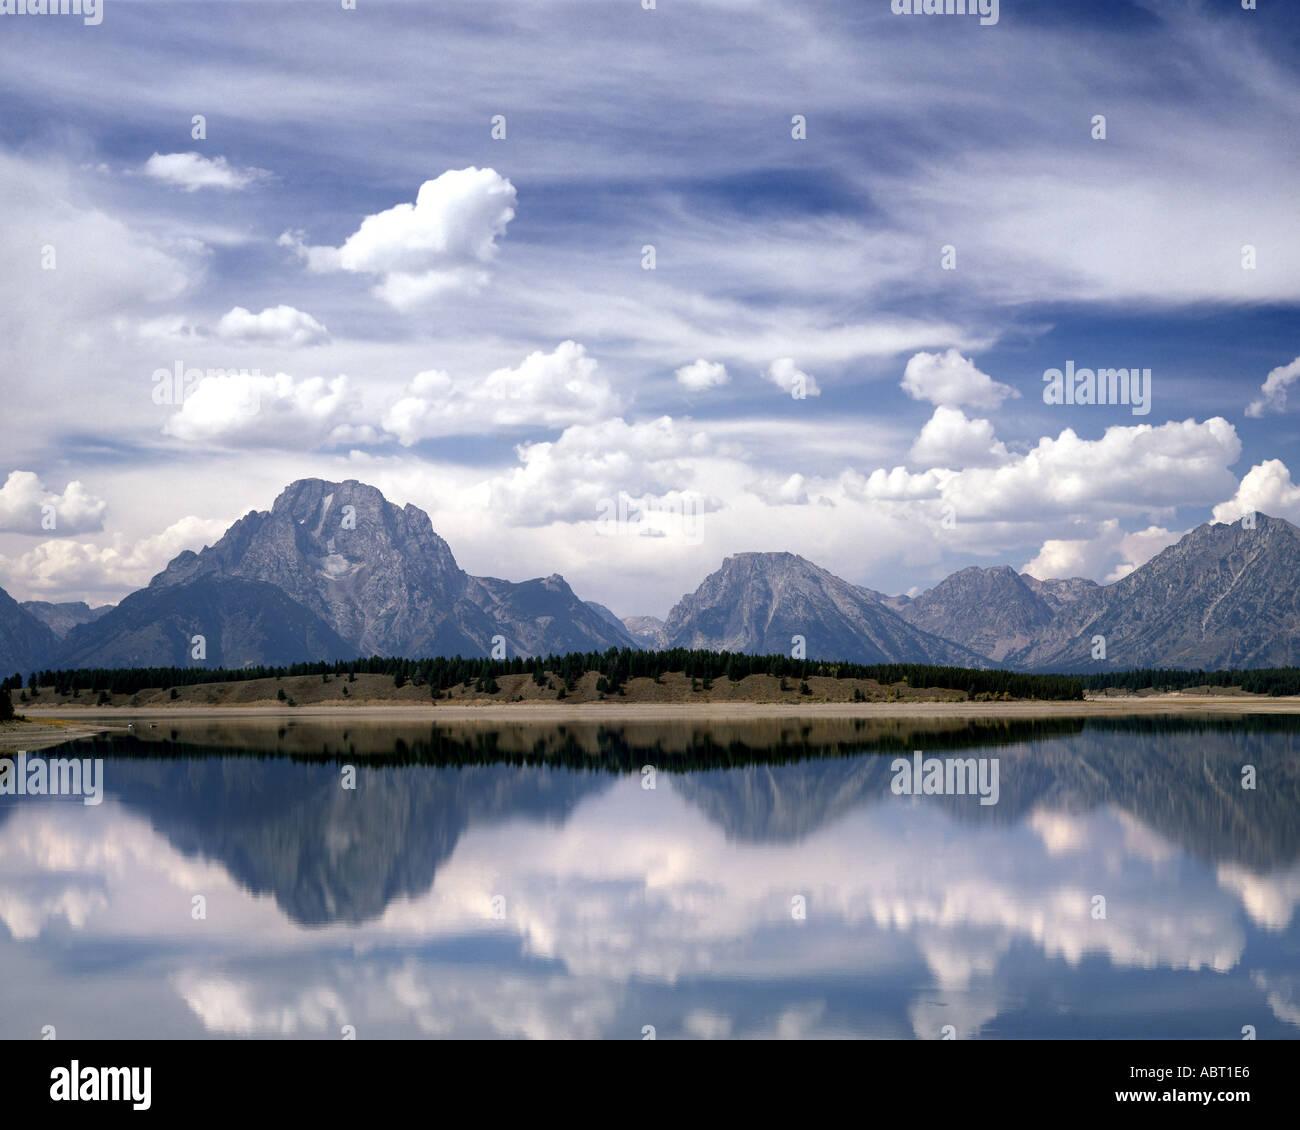 USA - WYOMING: Grand Tetons National Park - Stock Image